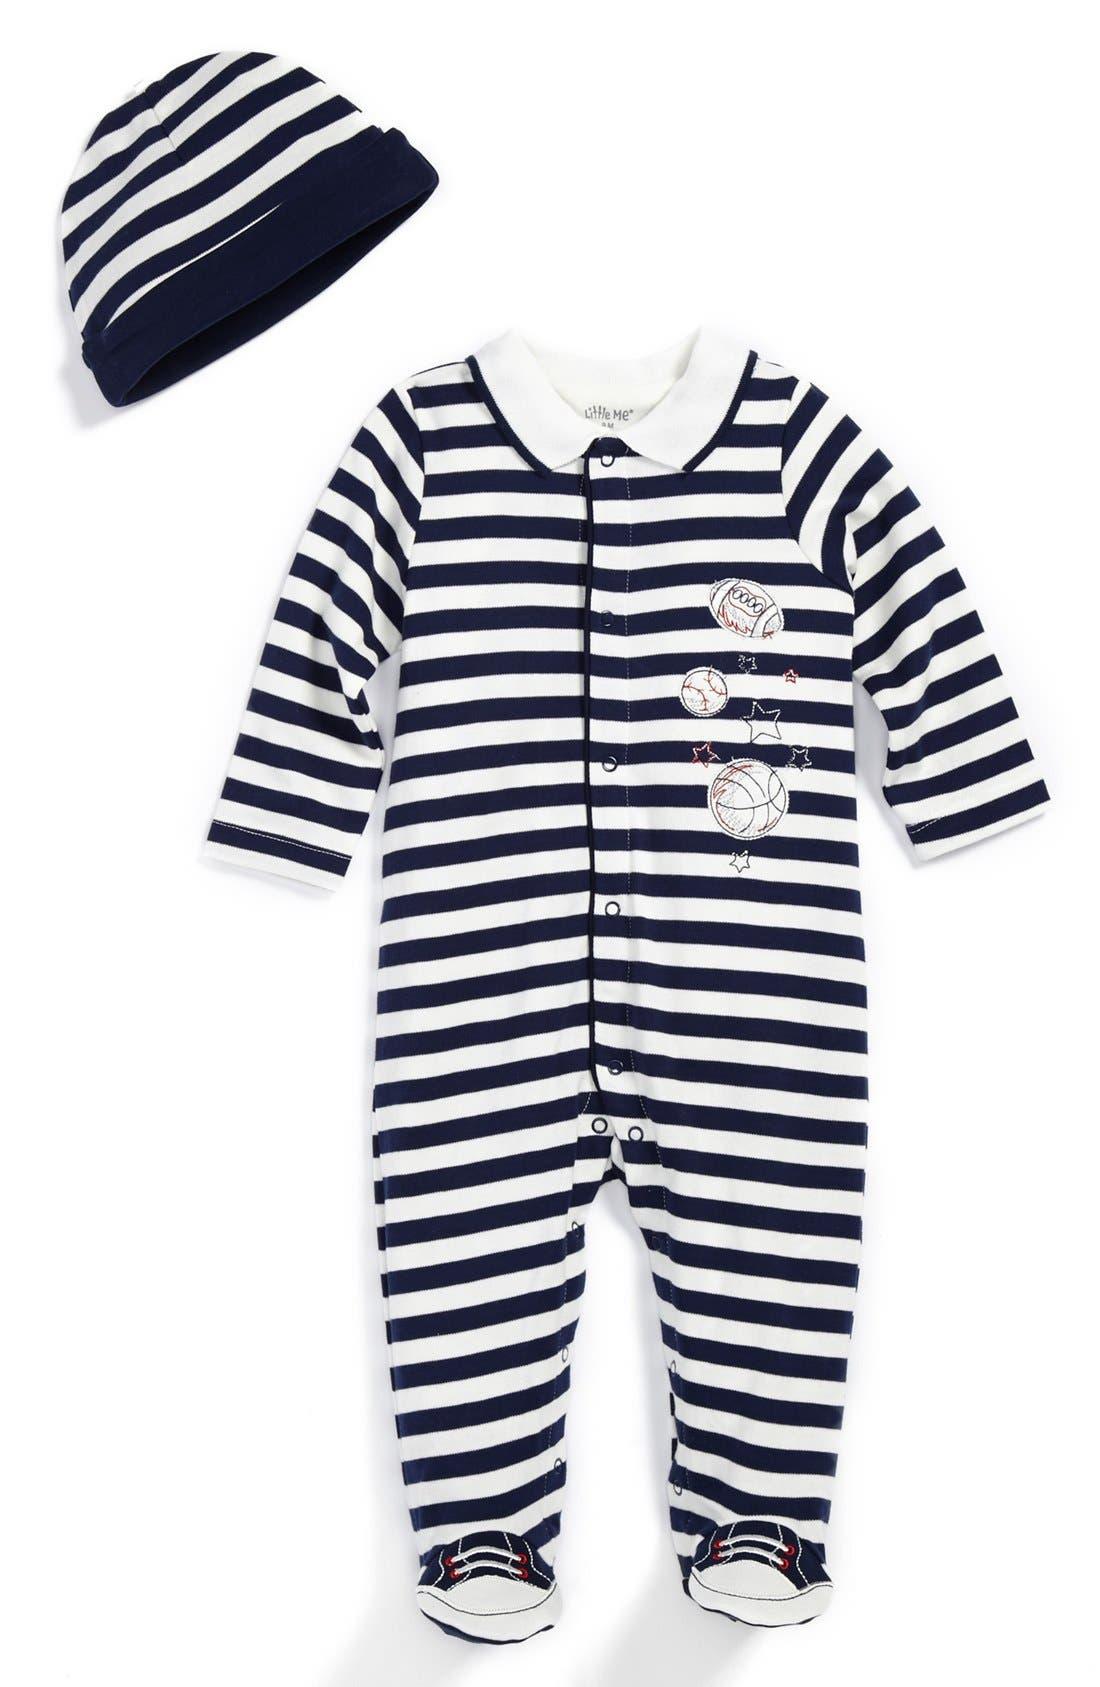 Alternate Image 1 Selected - Little Me 'Sport Star' Footie & Hat (Baby Boys)